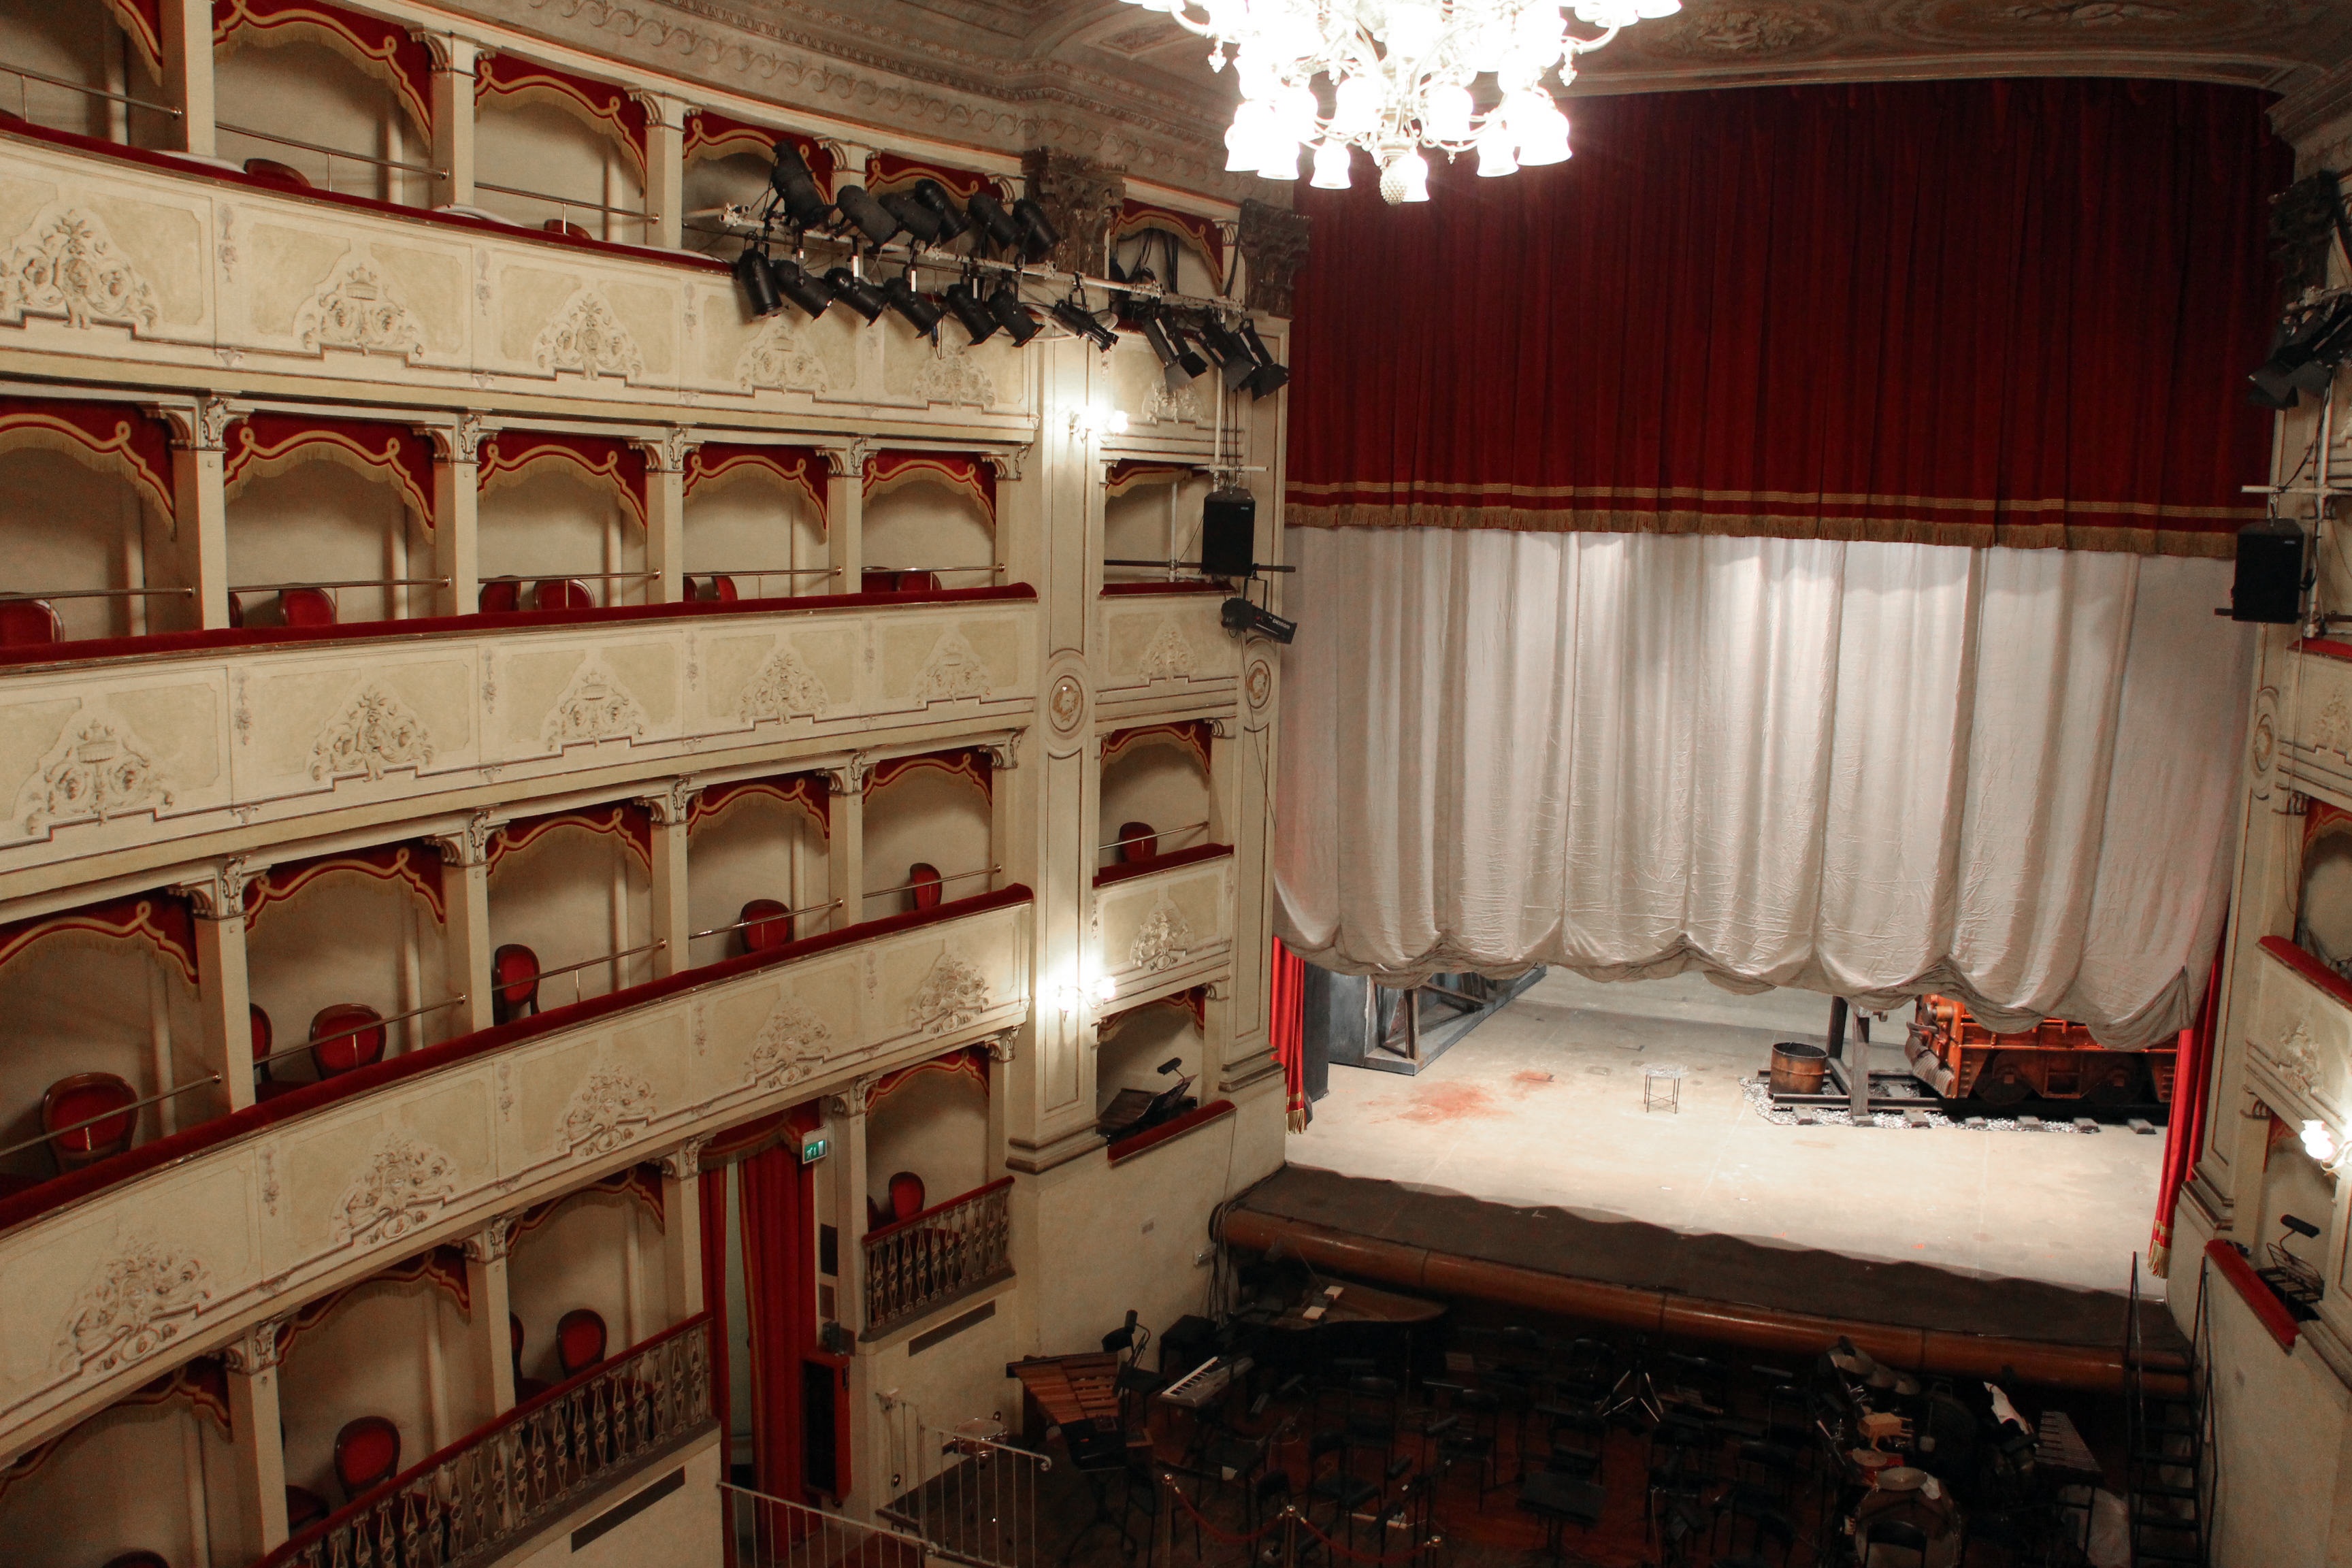 「3D能」を上演したベネチアのゴルドーニ劇場